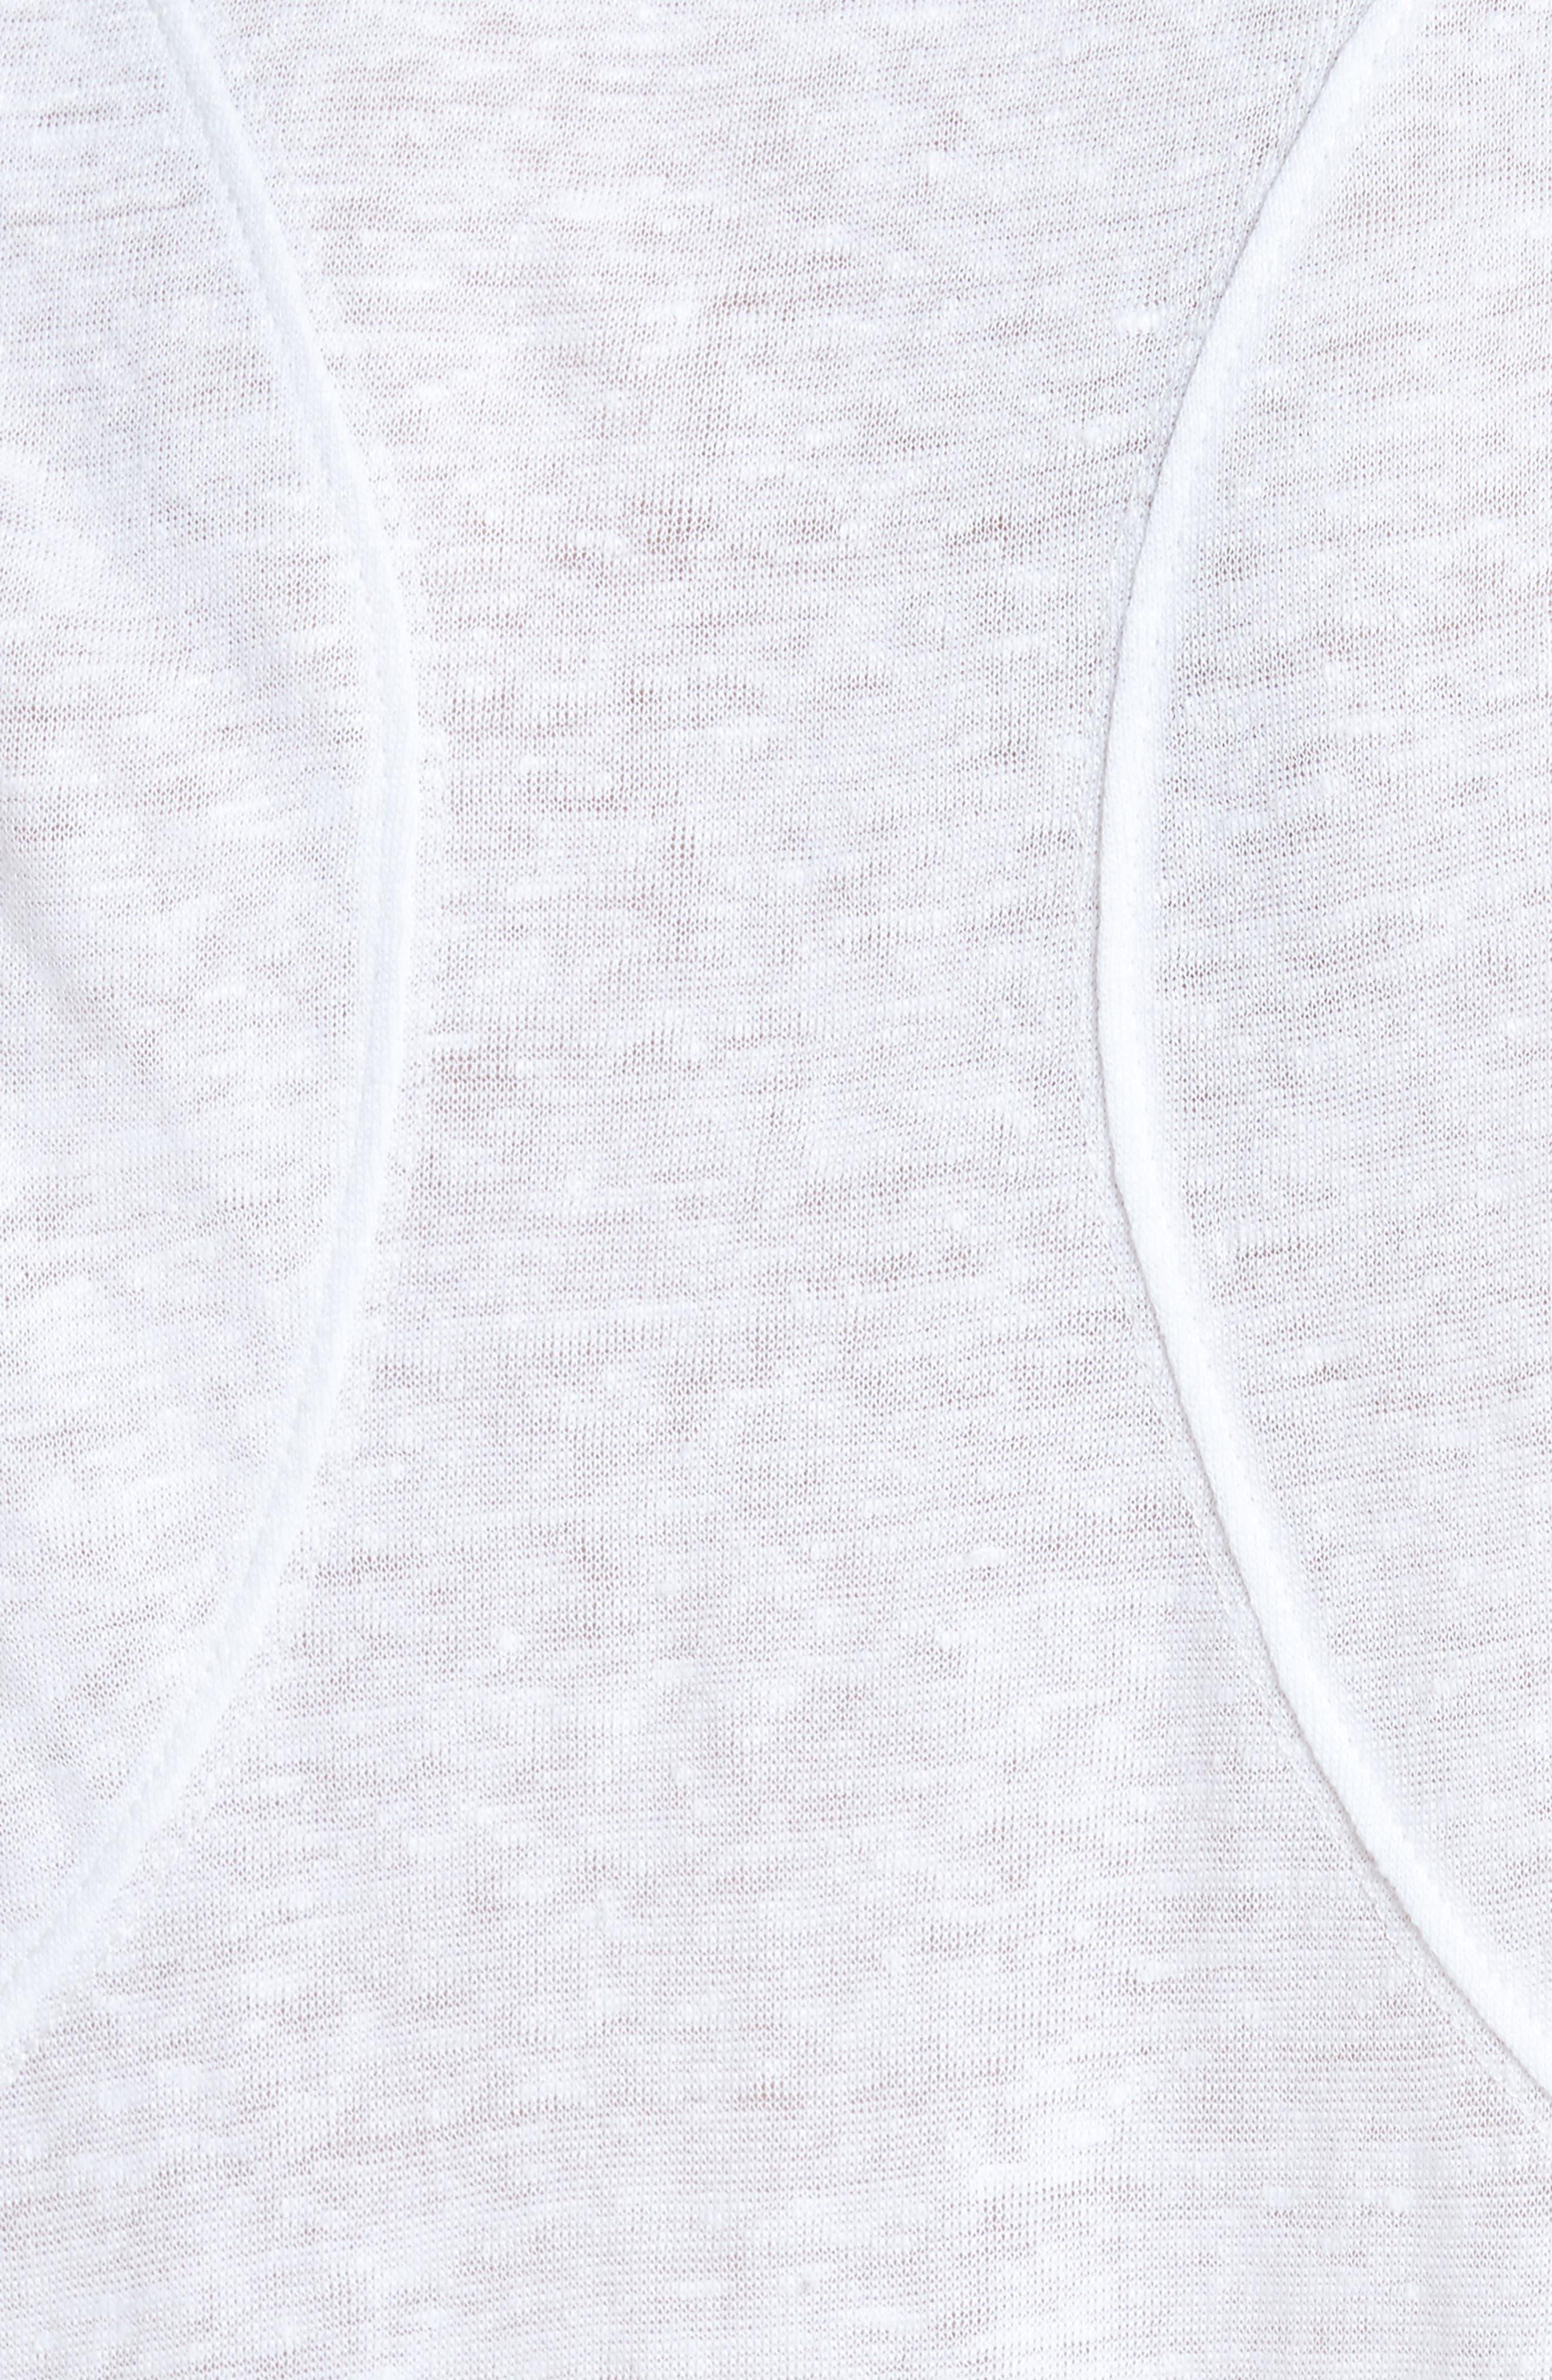 Lottie Tank,                             Alternate thumbnail 5, color,                             White